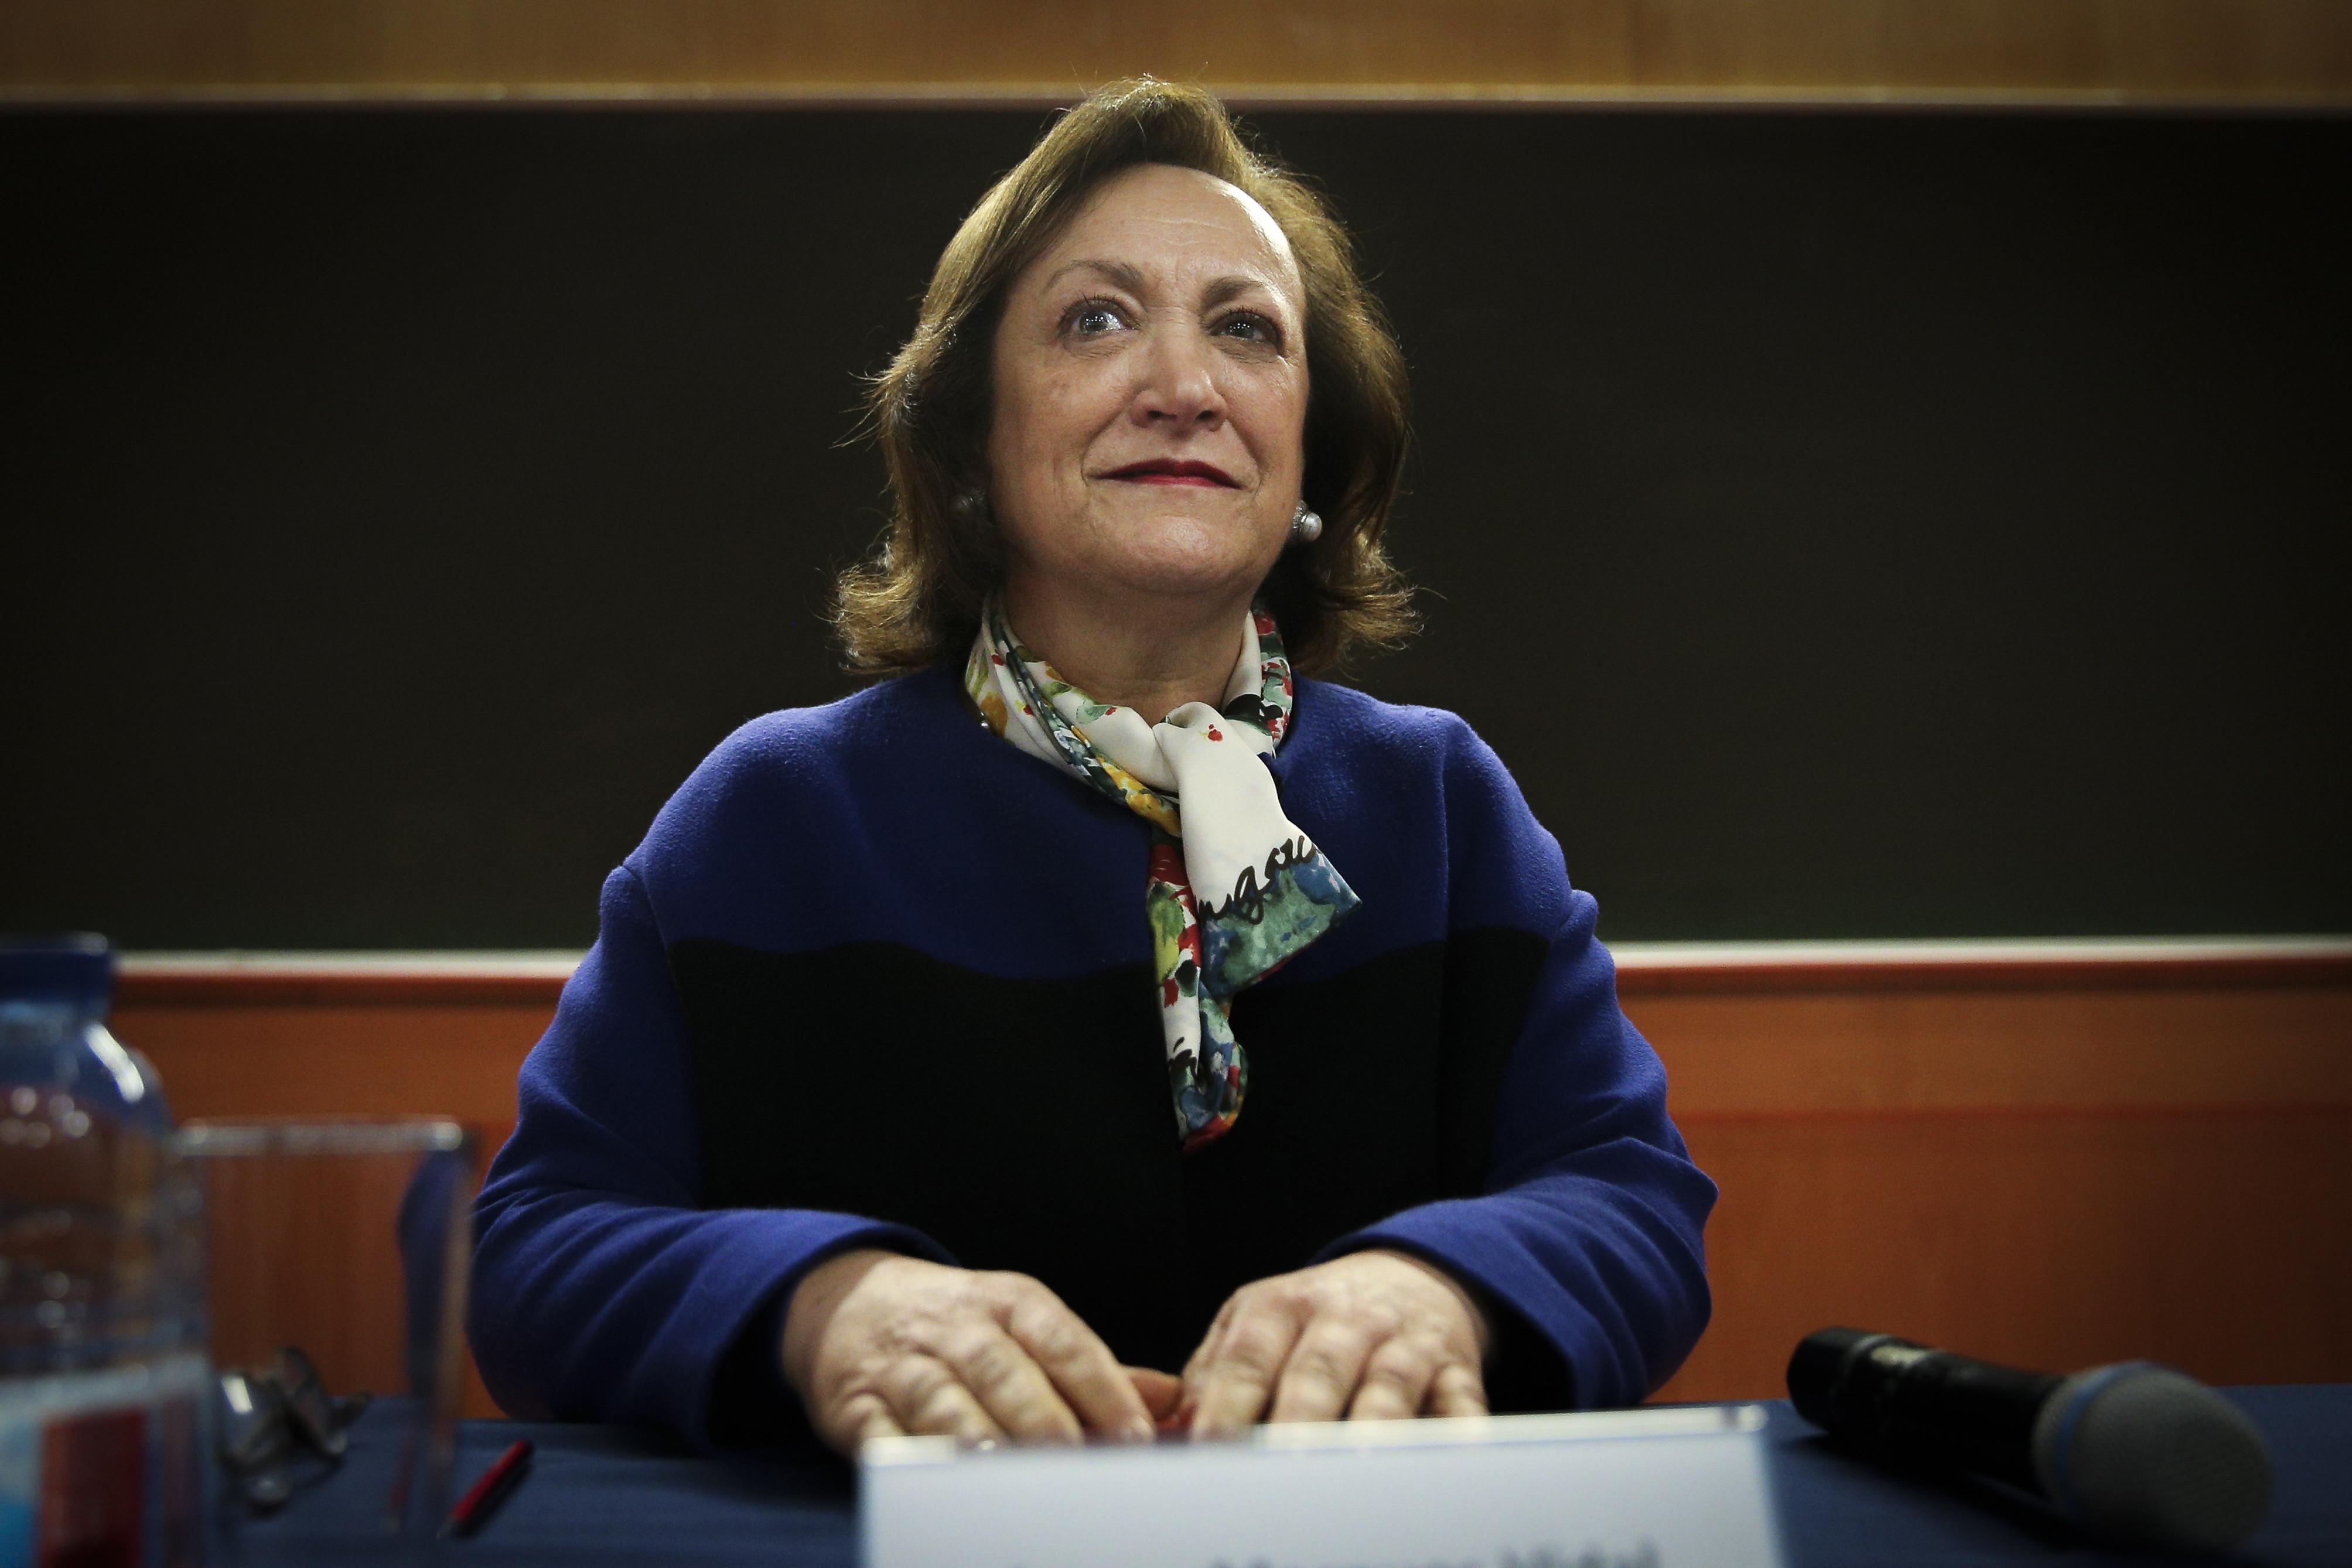 Tancos: Joana Marques Vidal acusa PJ Militar de agir ilegalmente